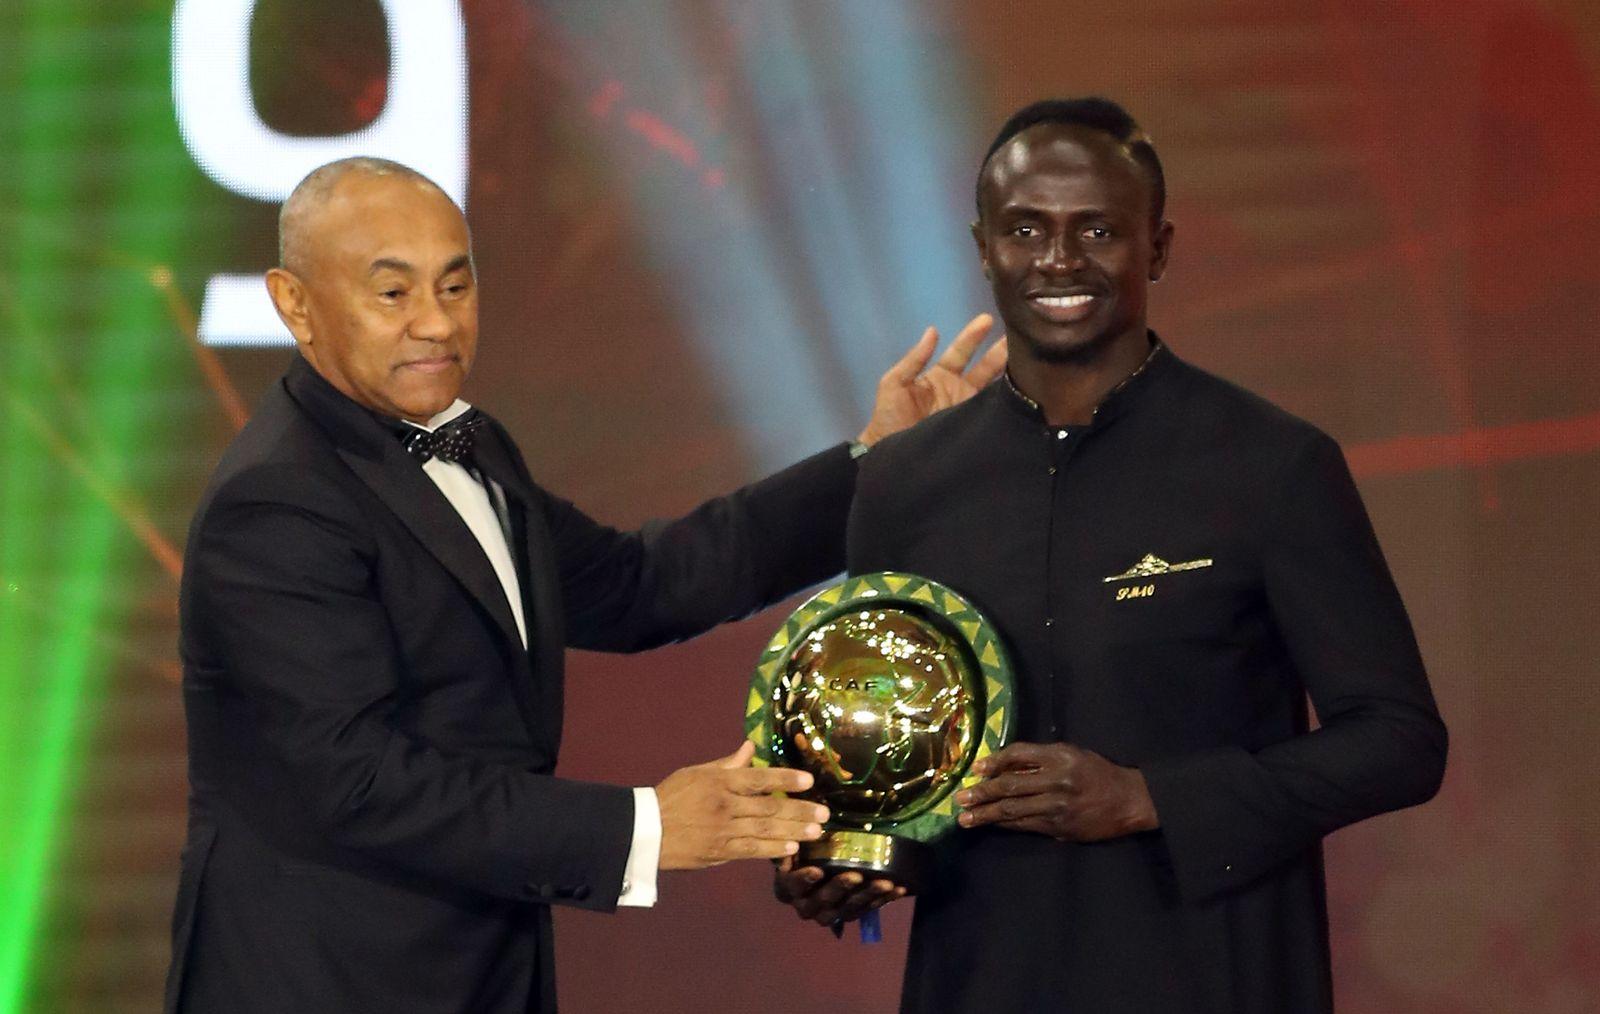 Confederation of African Football Awards, Hurghada, Egypt - 07 Jan 2020